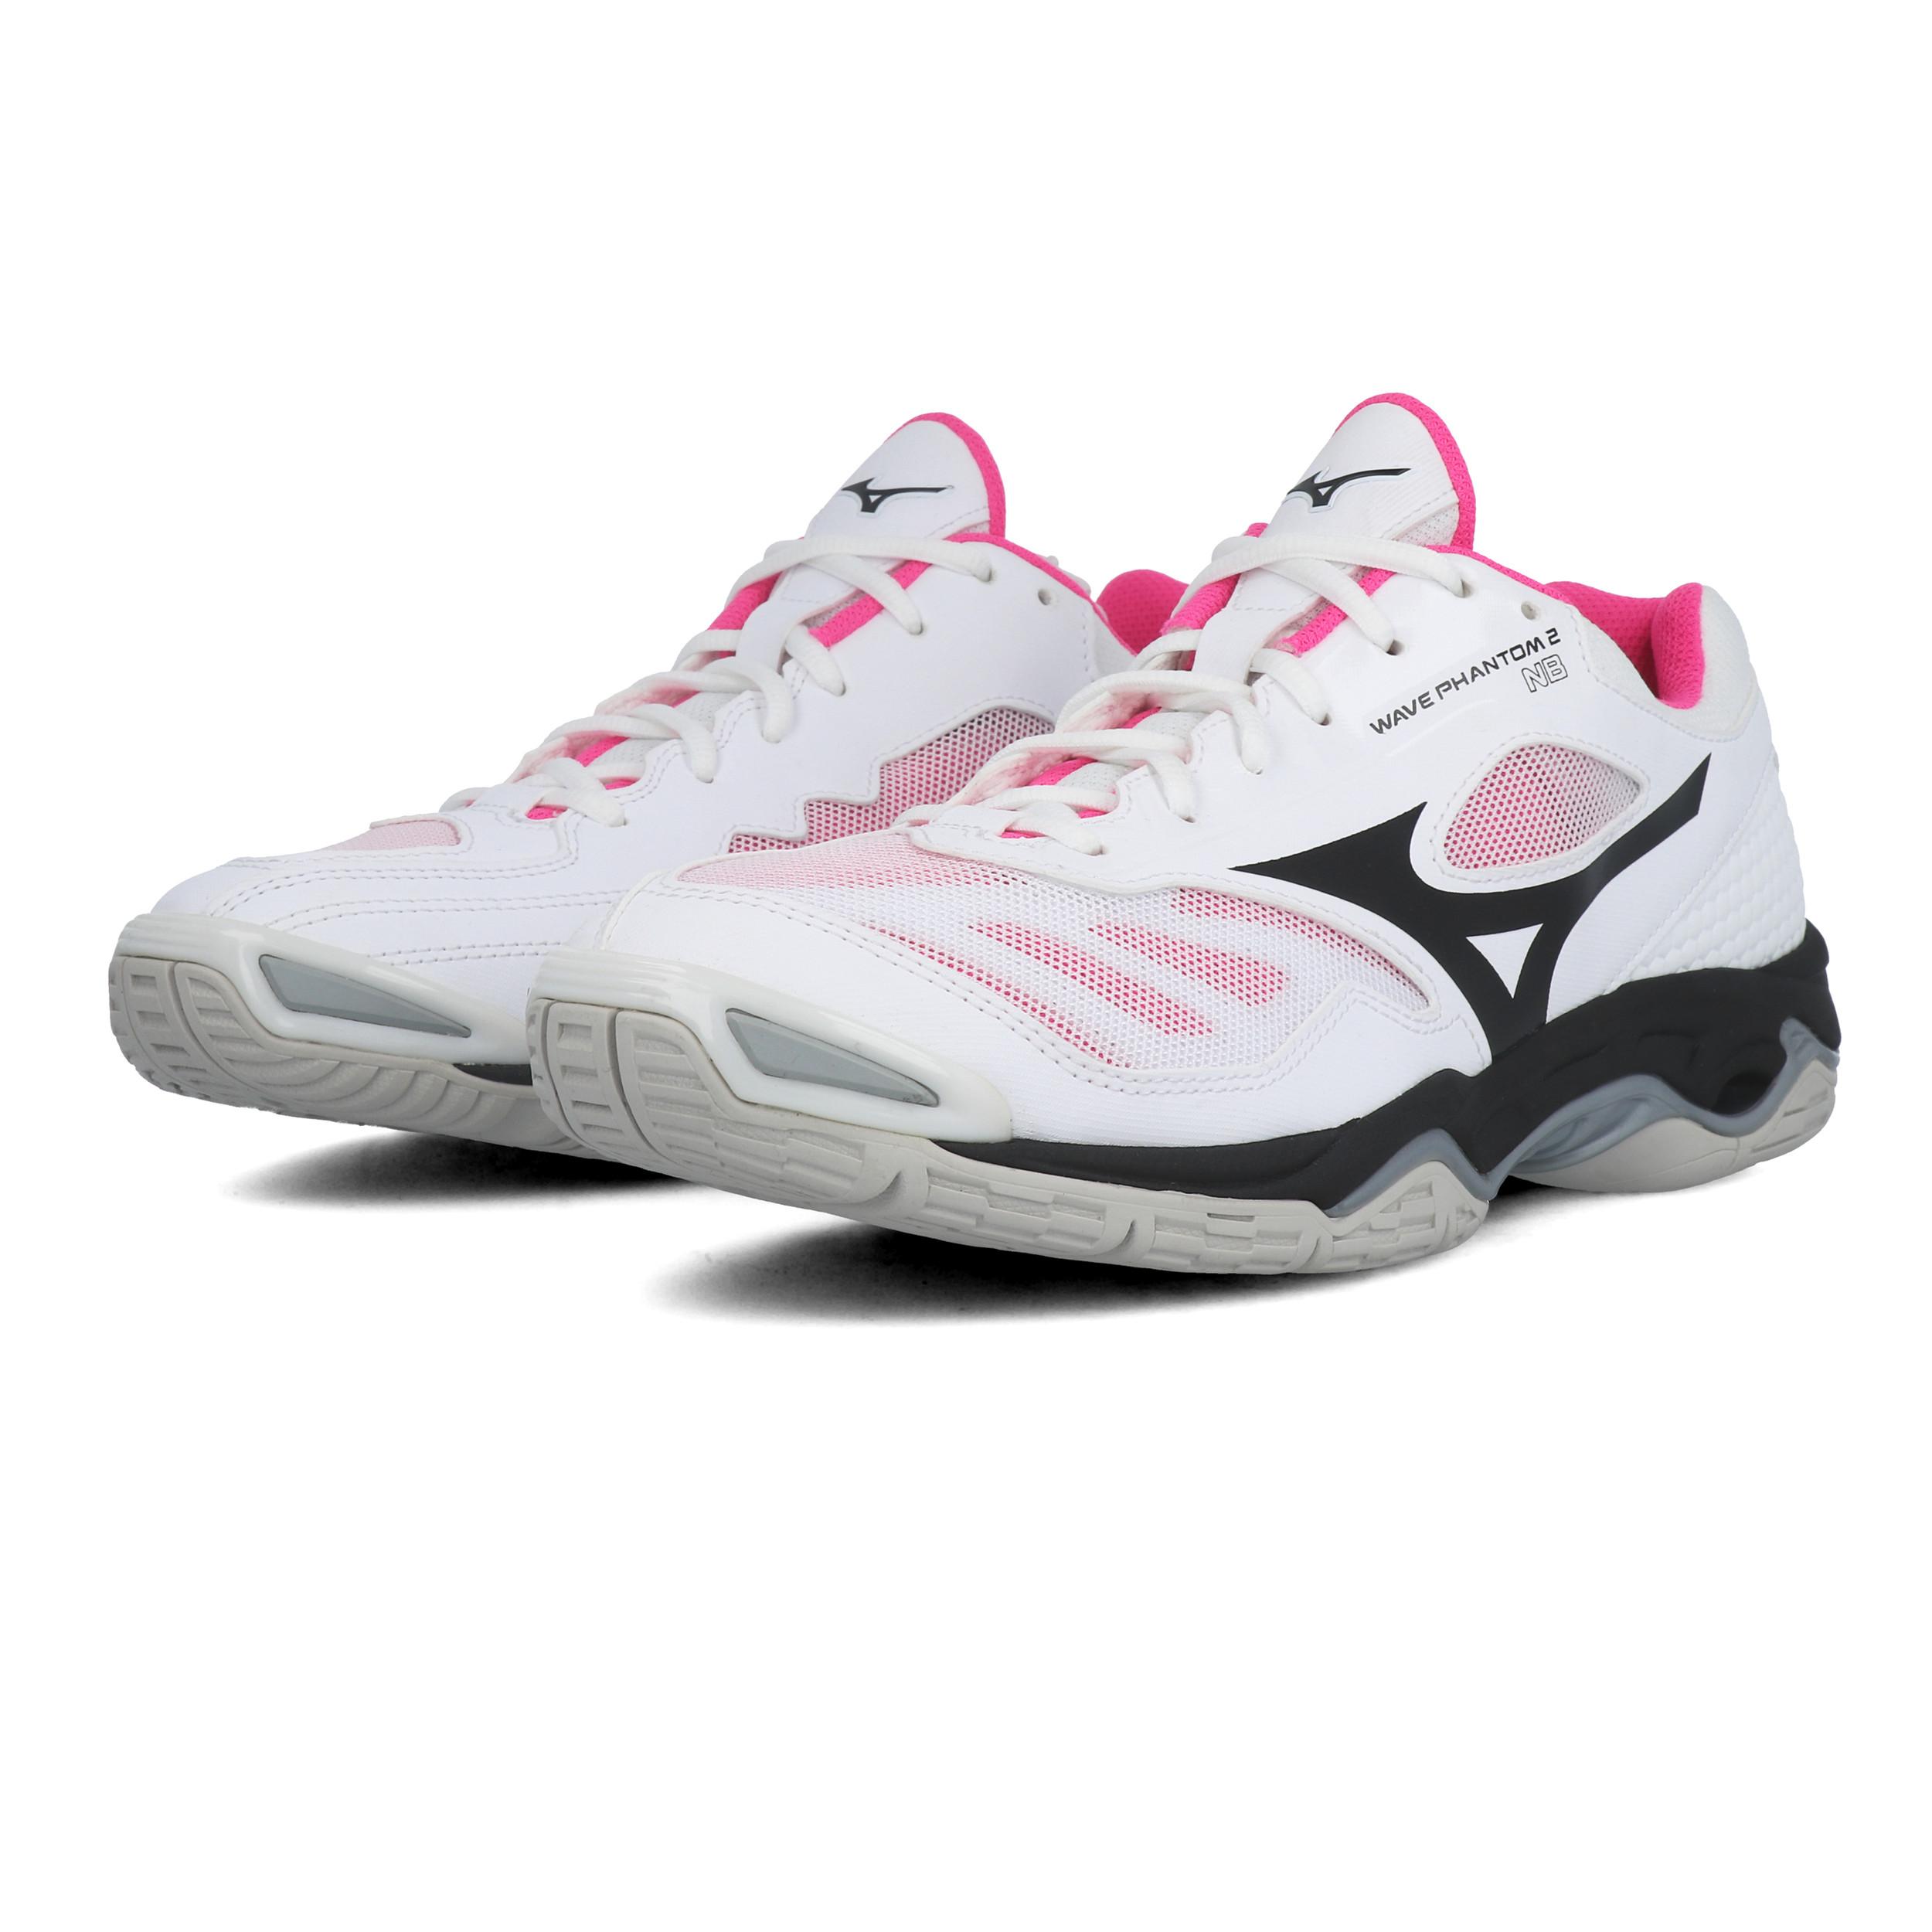 Mizuno Wave Phantom 2 NB Women's Netball Shoes